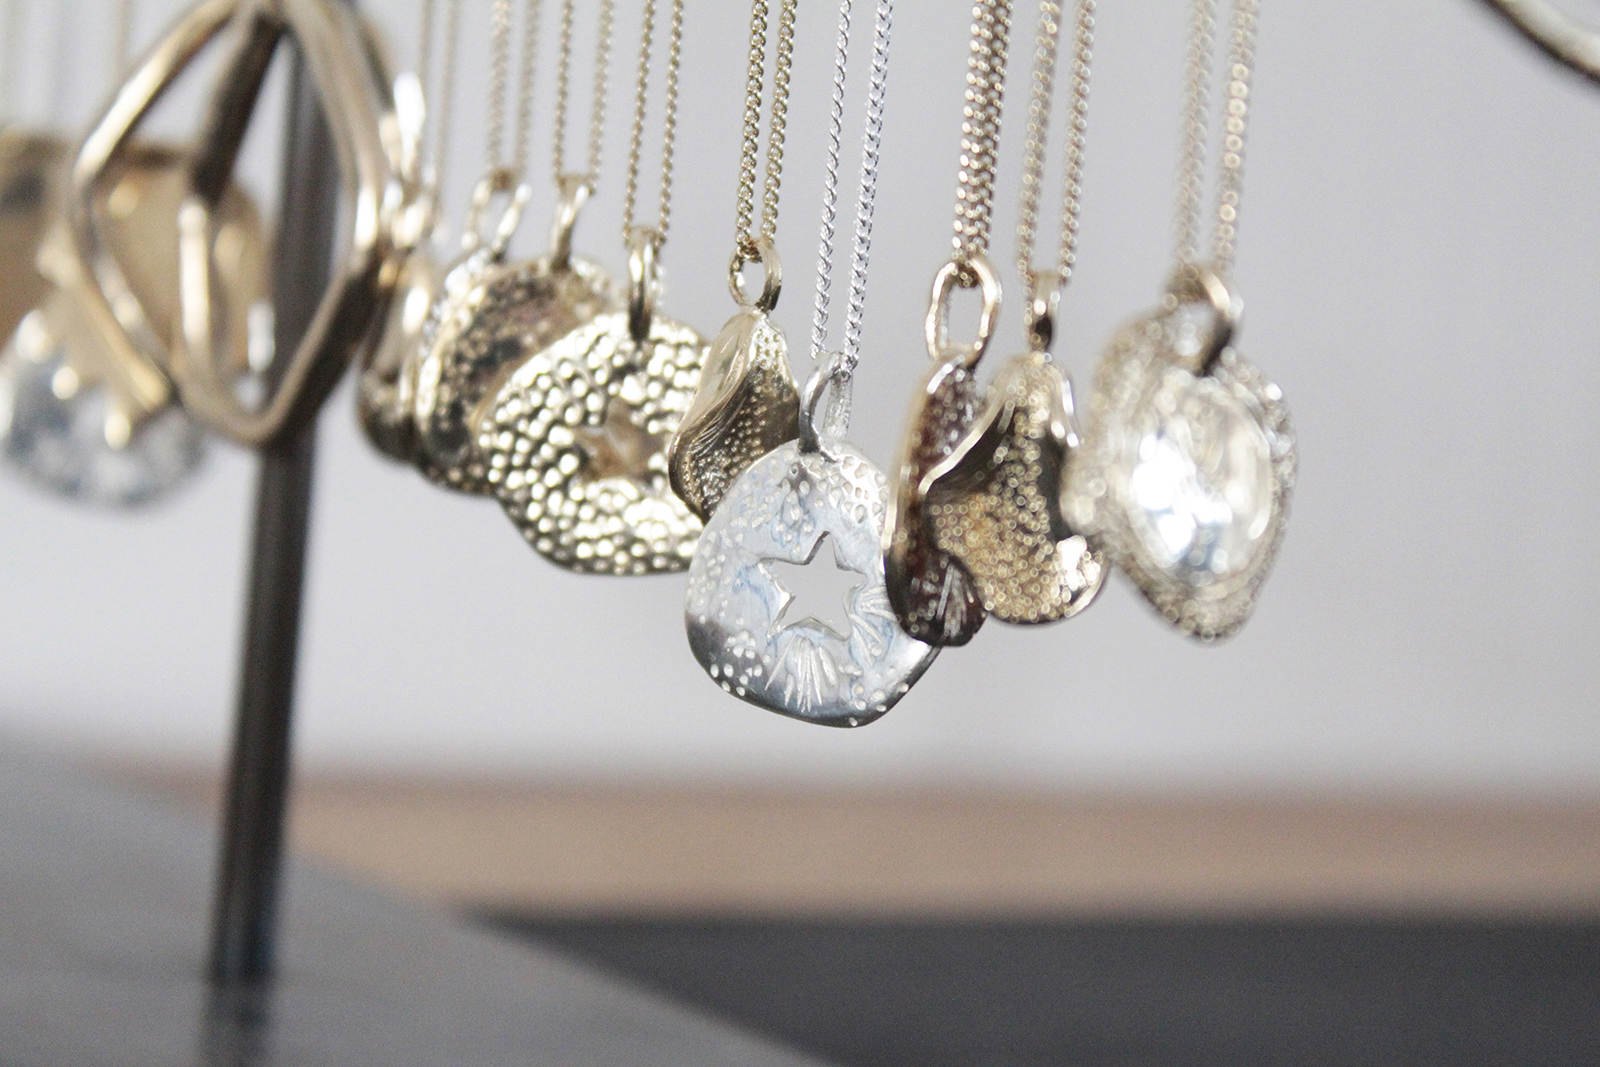 celine-lareynie-bijoux-fantaisie-colliers-en-argent-et-en-or-med